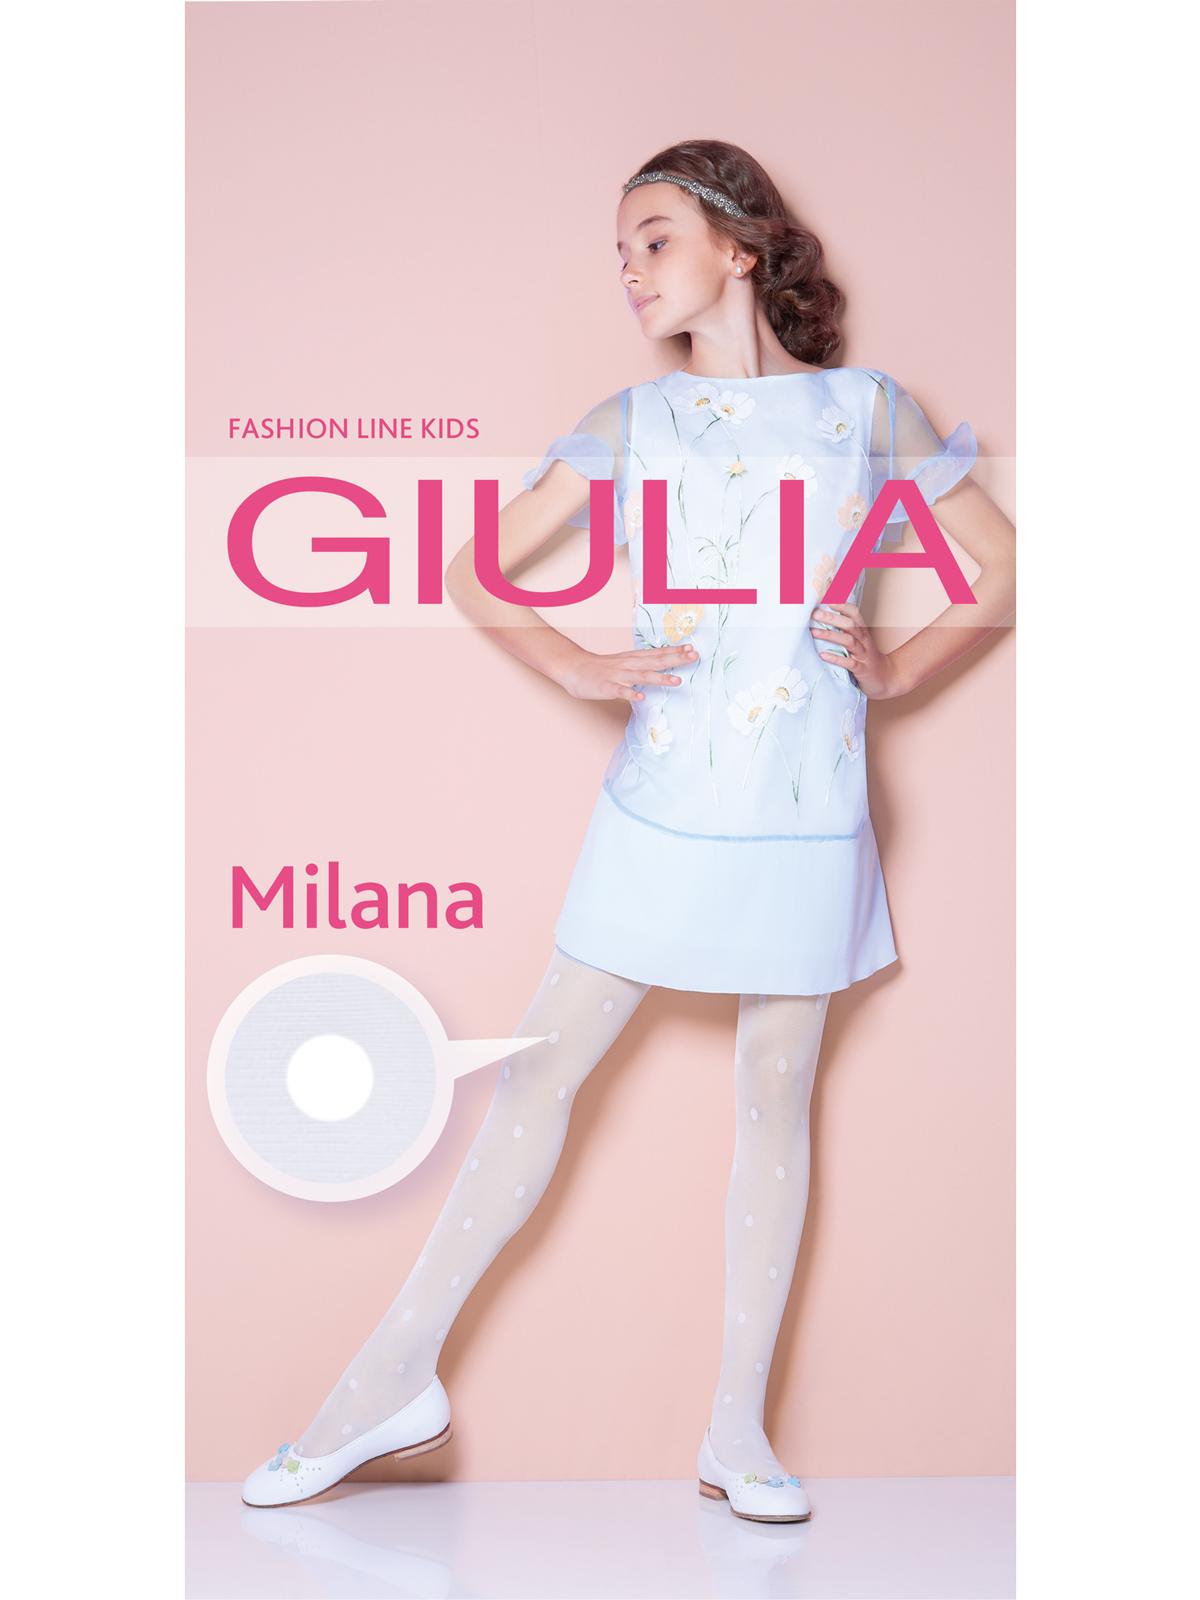 Giulia MILANA 40 №6 колготки детские